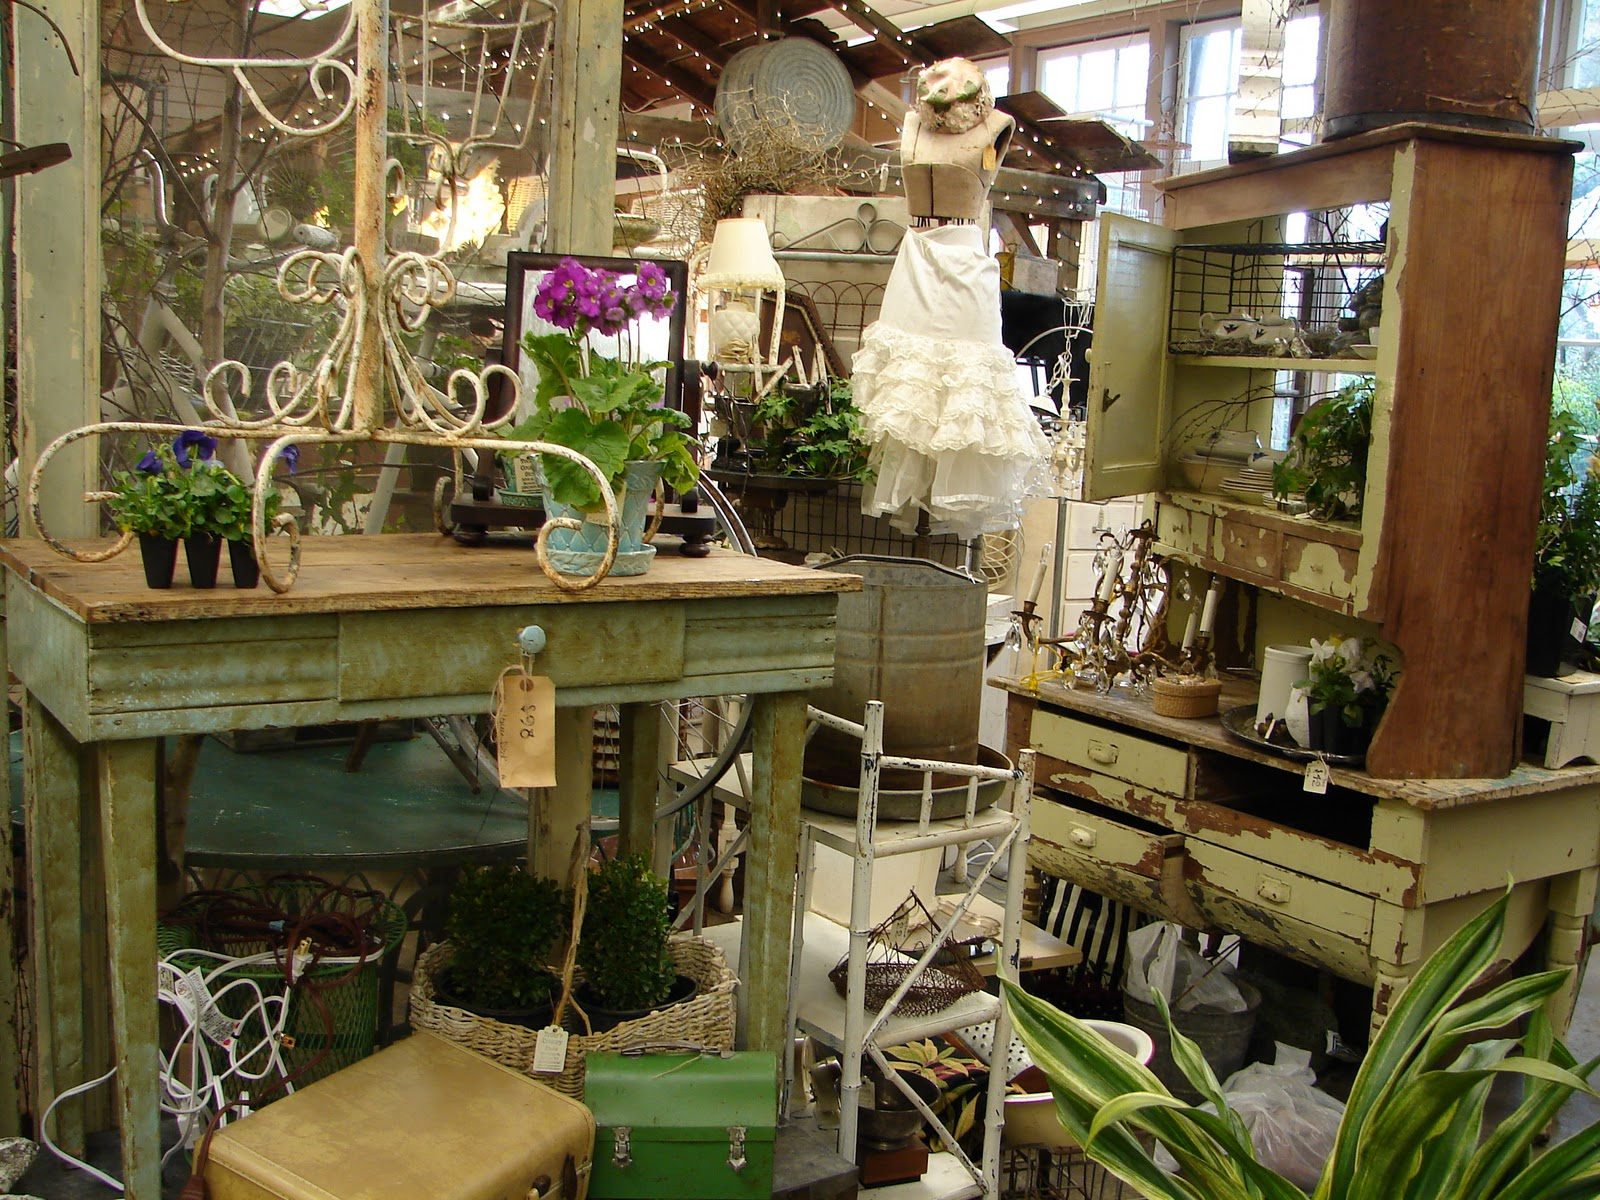 Monticello Antique Marketplace: Garden Show Sneeky Peeks!!